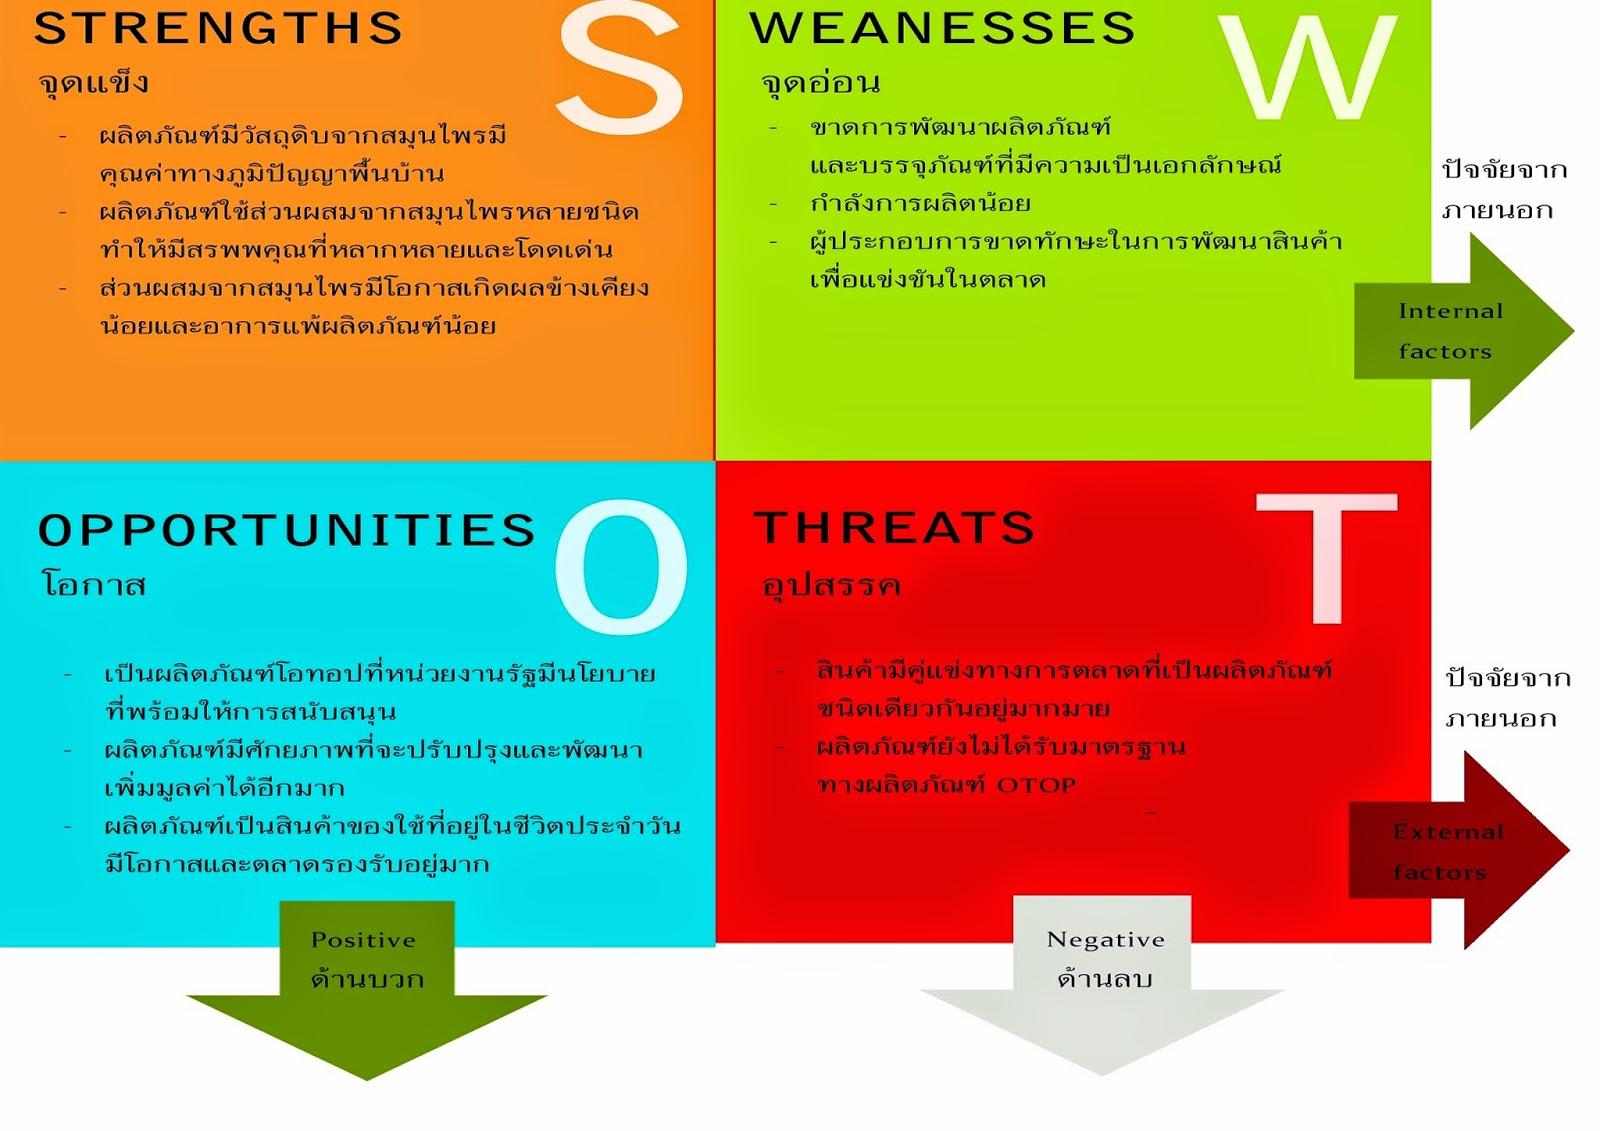 Del Monte Foods (DLM) SWOT Analysis